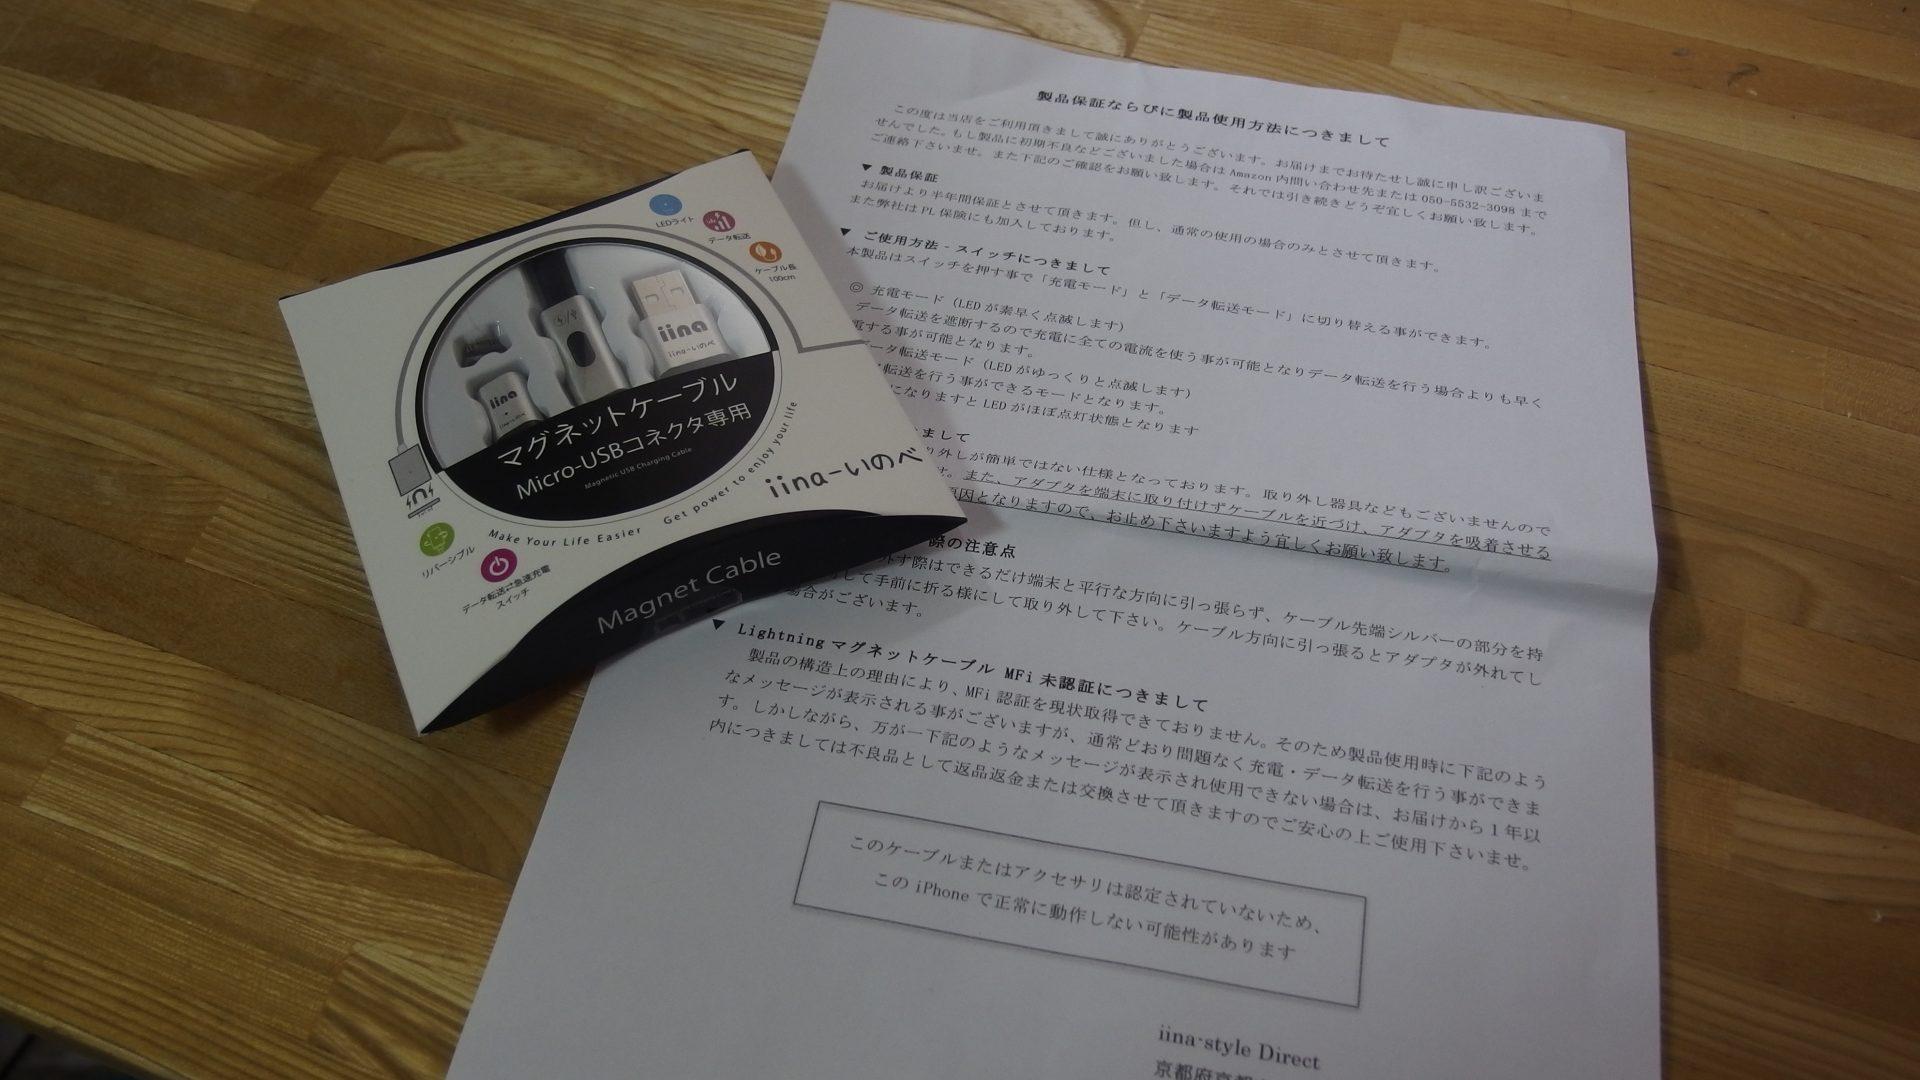 iina-いのべ マグネットケーブル